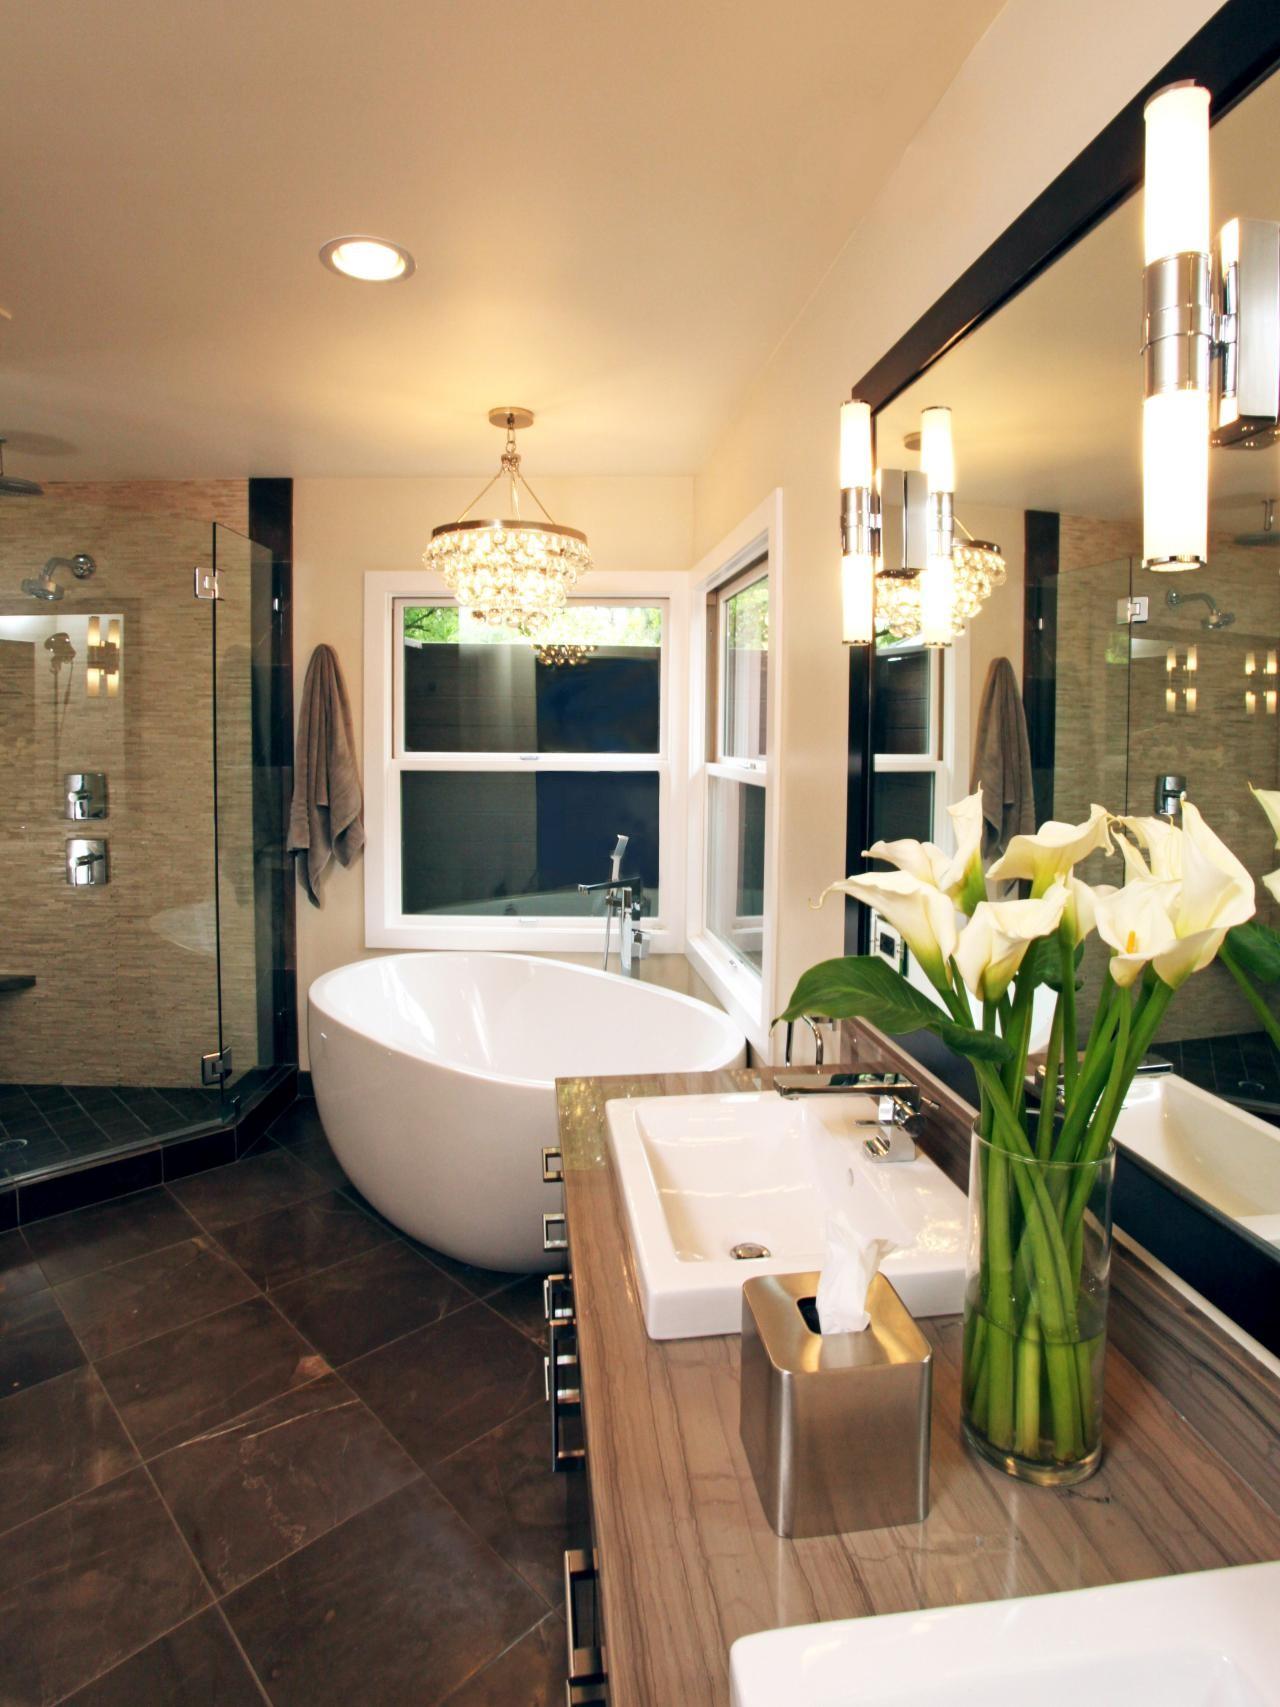 Stylish Tropical Bathroom Decor Pattern - Home Sweet Home ...